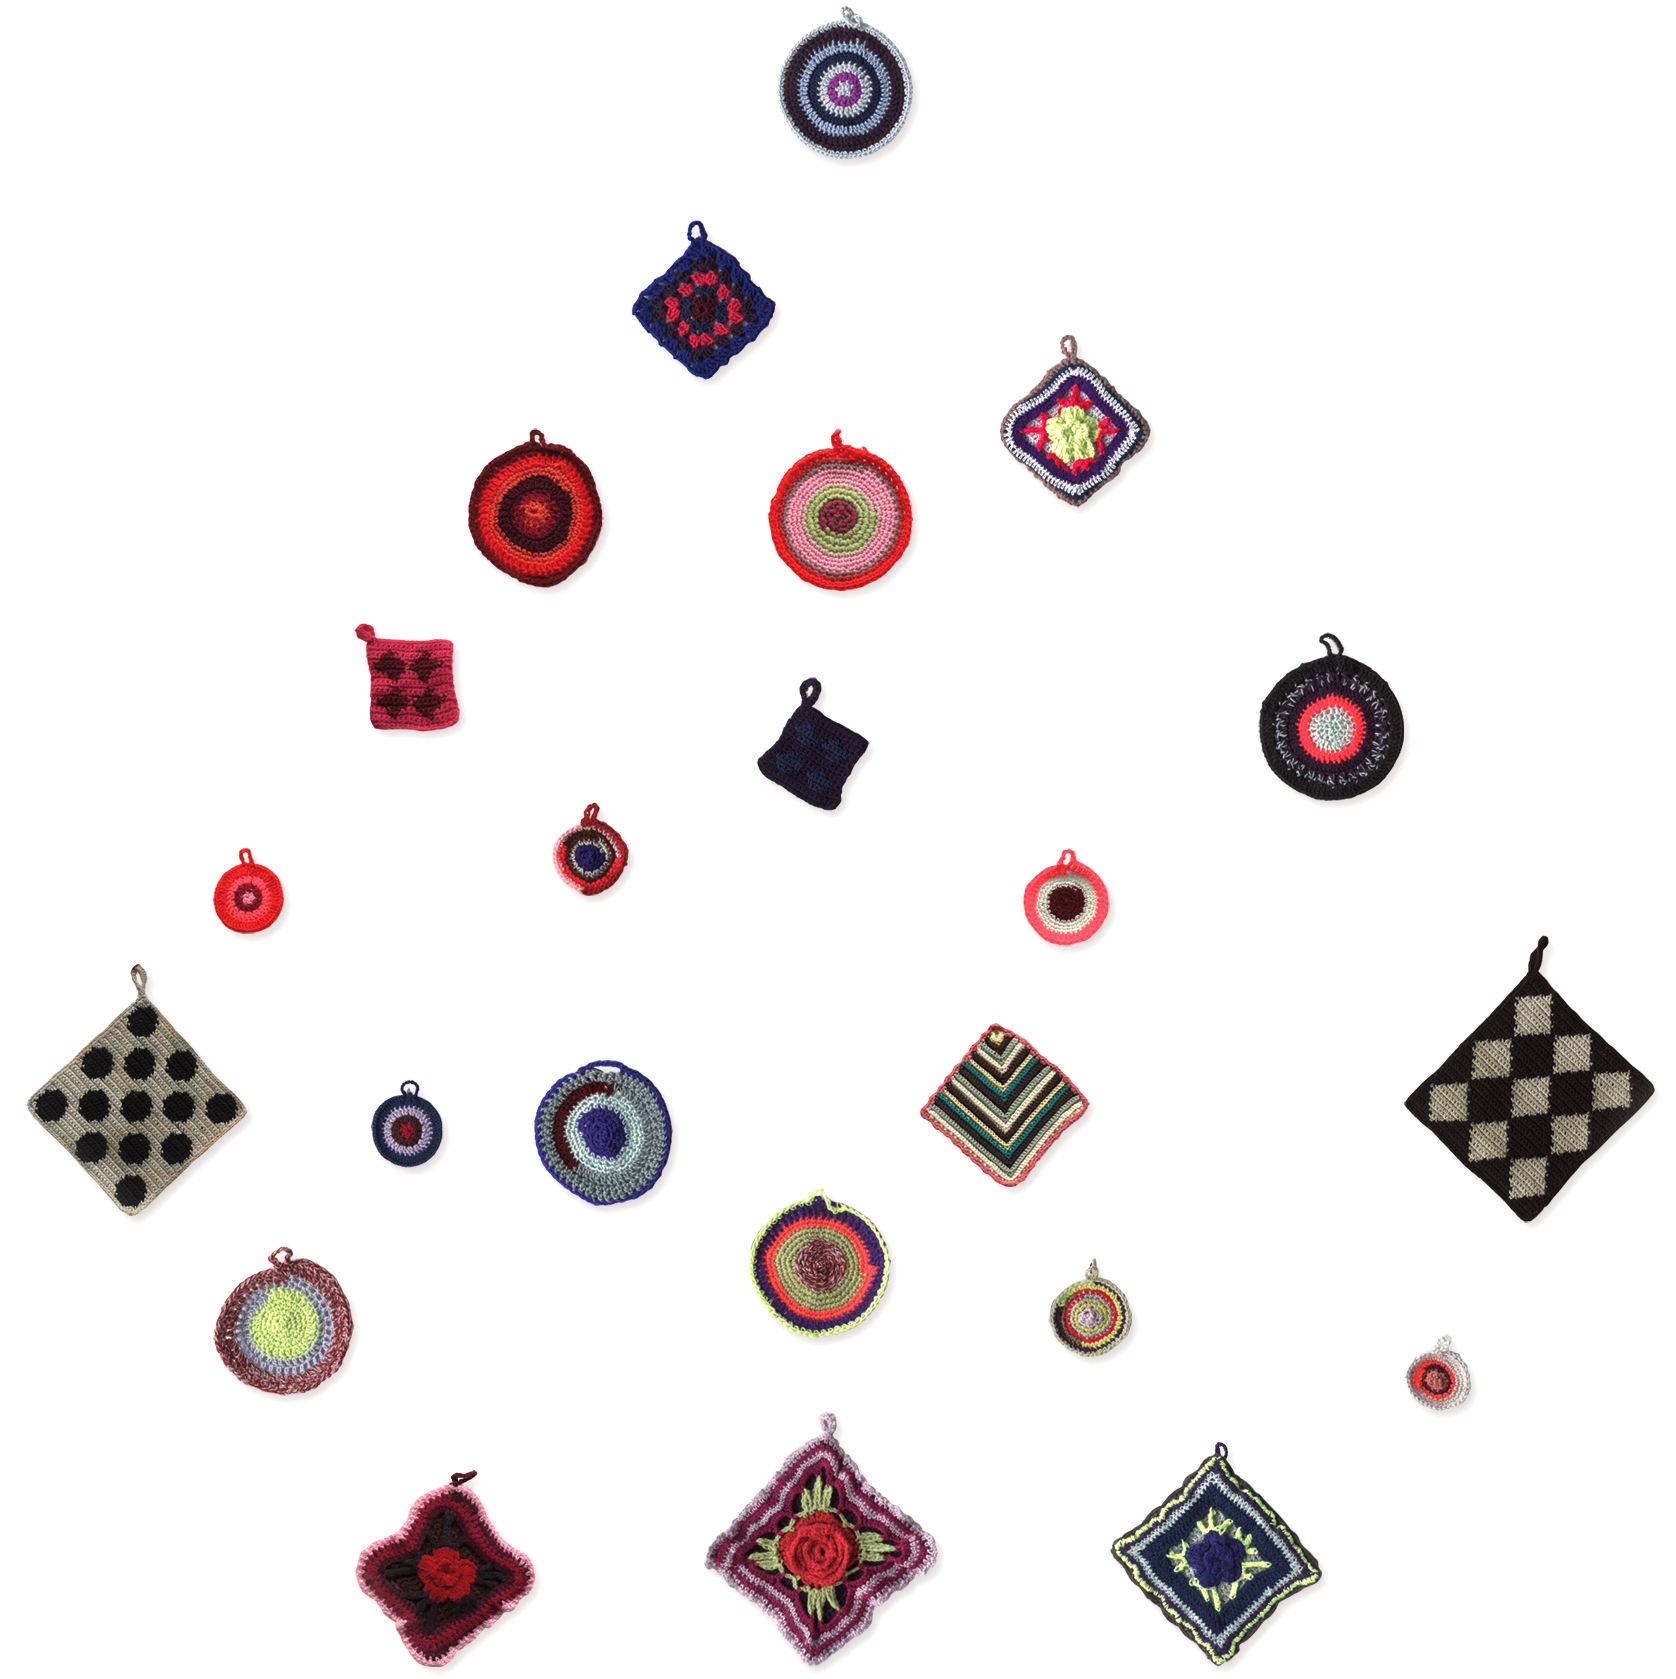 Dekoration - Stickers und Tapeten - Napperons 2 Sticker / 23er-Set - Domestic - 23er-Set / mehrfarbig - Vinyl